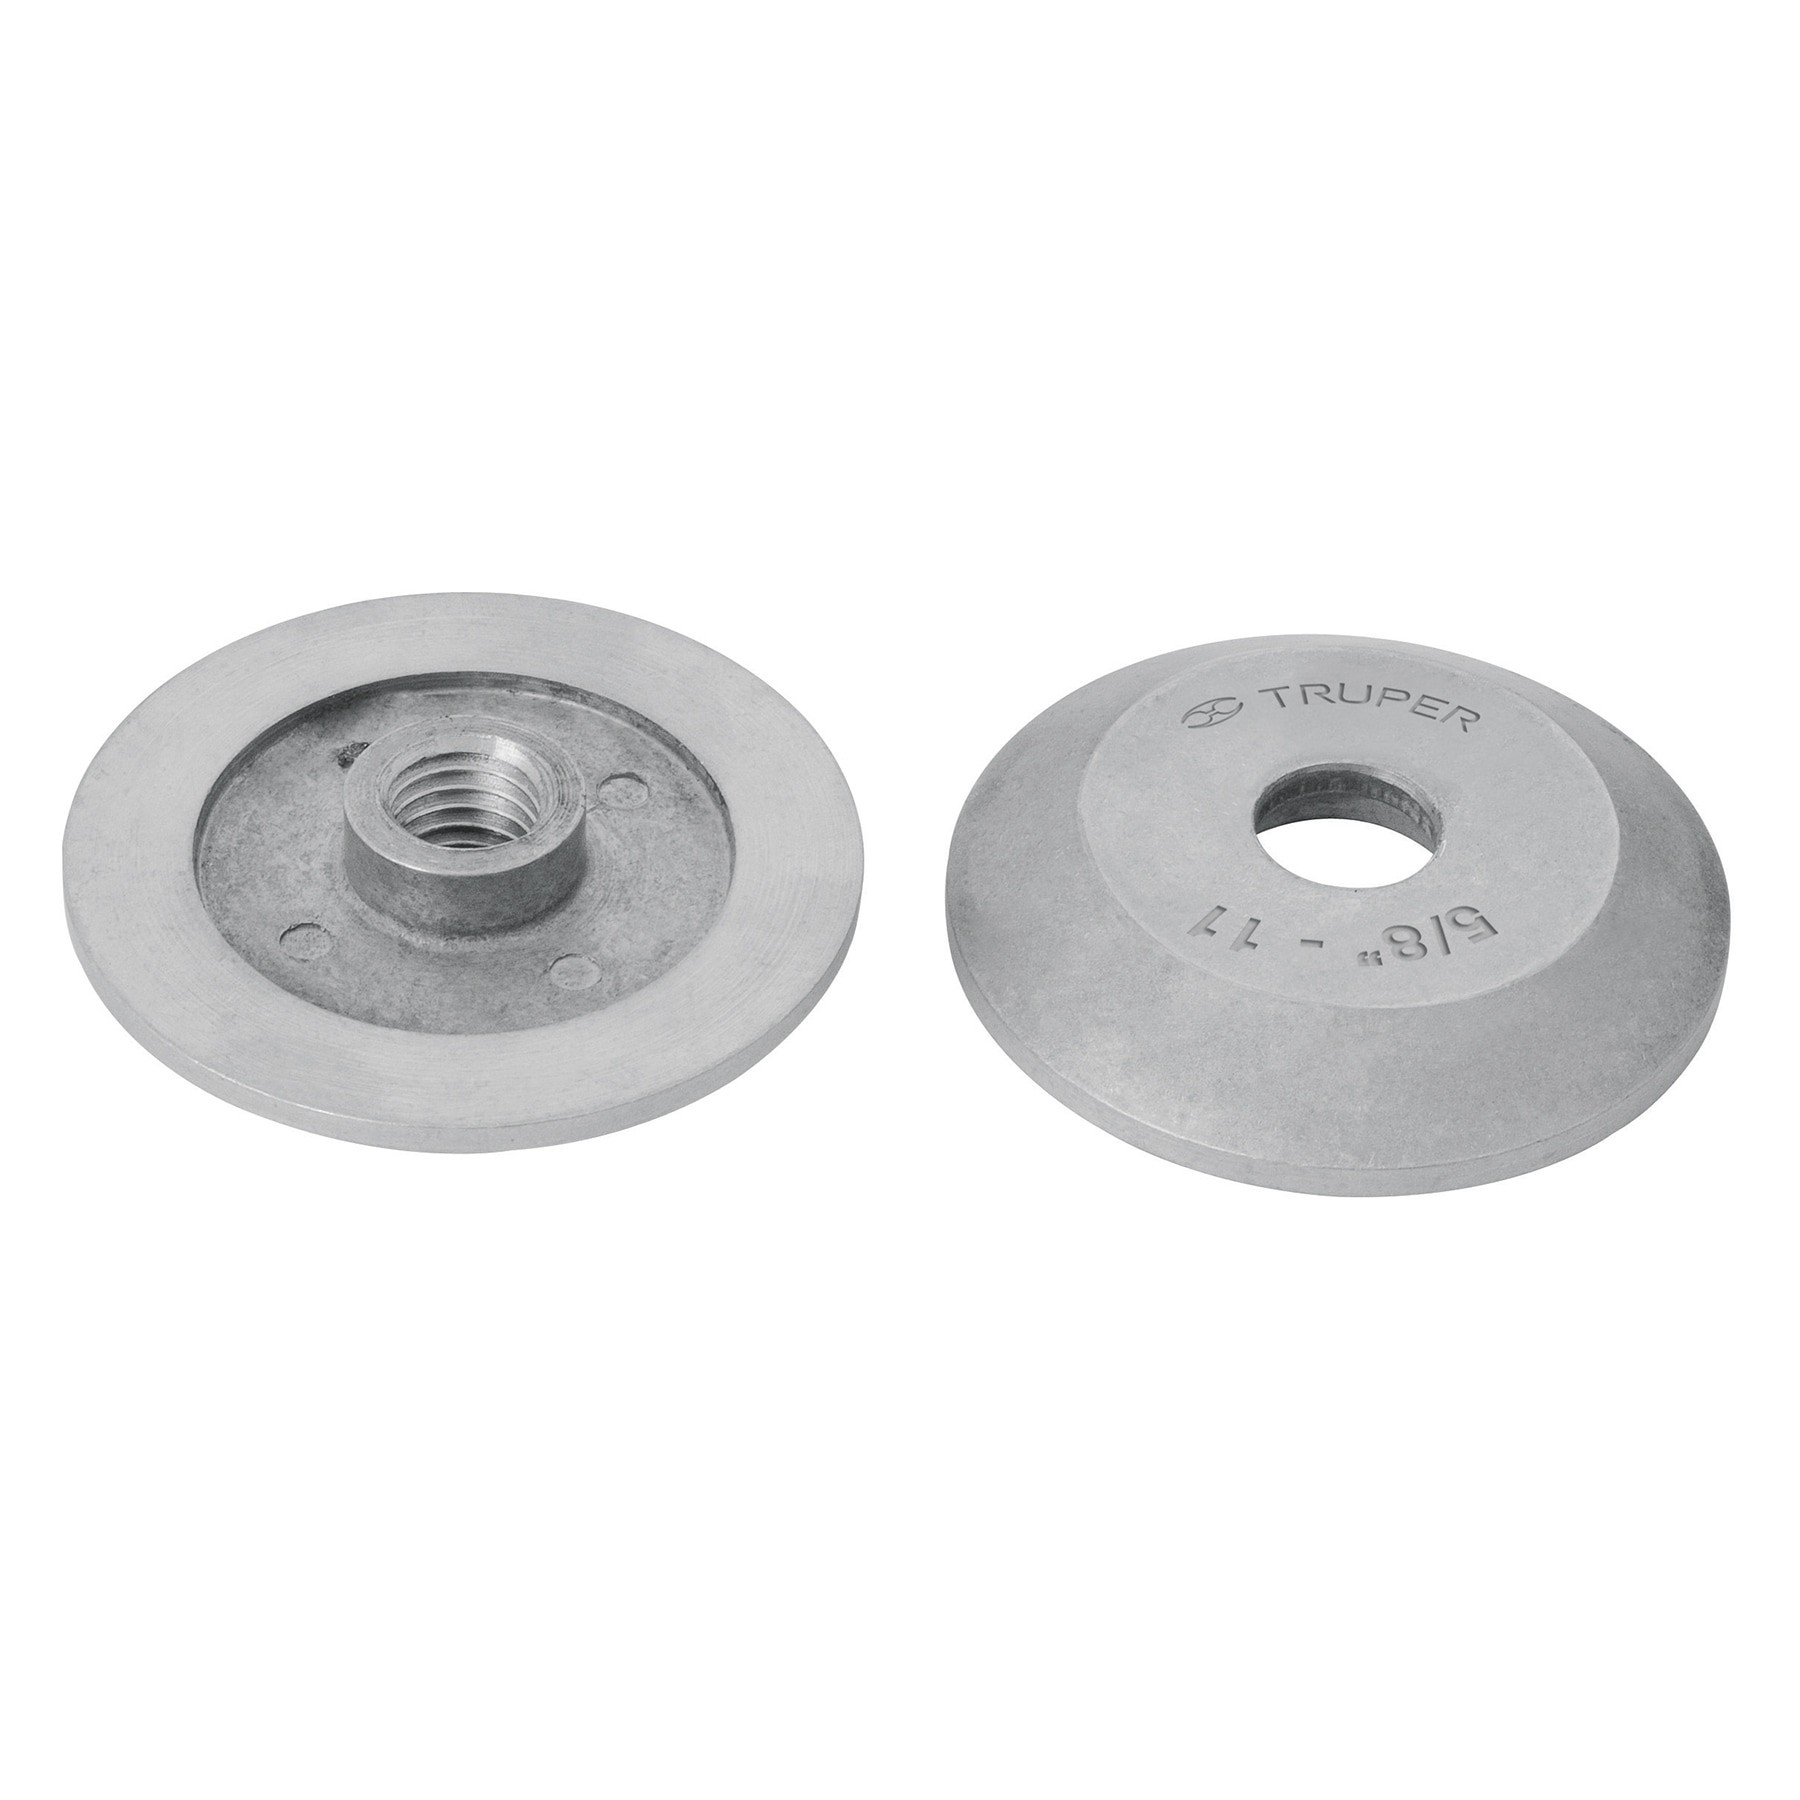 "Adaptador para discos tipo 41, rosca, 5/8-11 NC, de 7-9"" std"